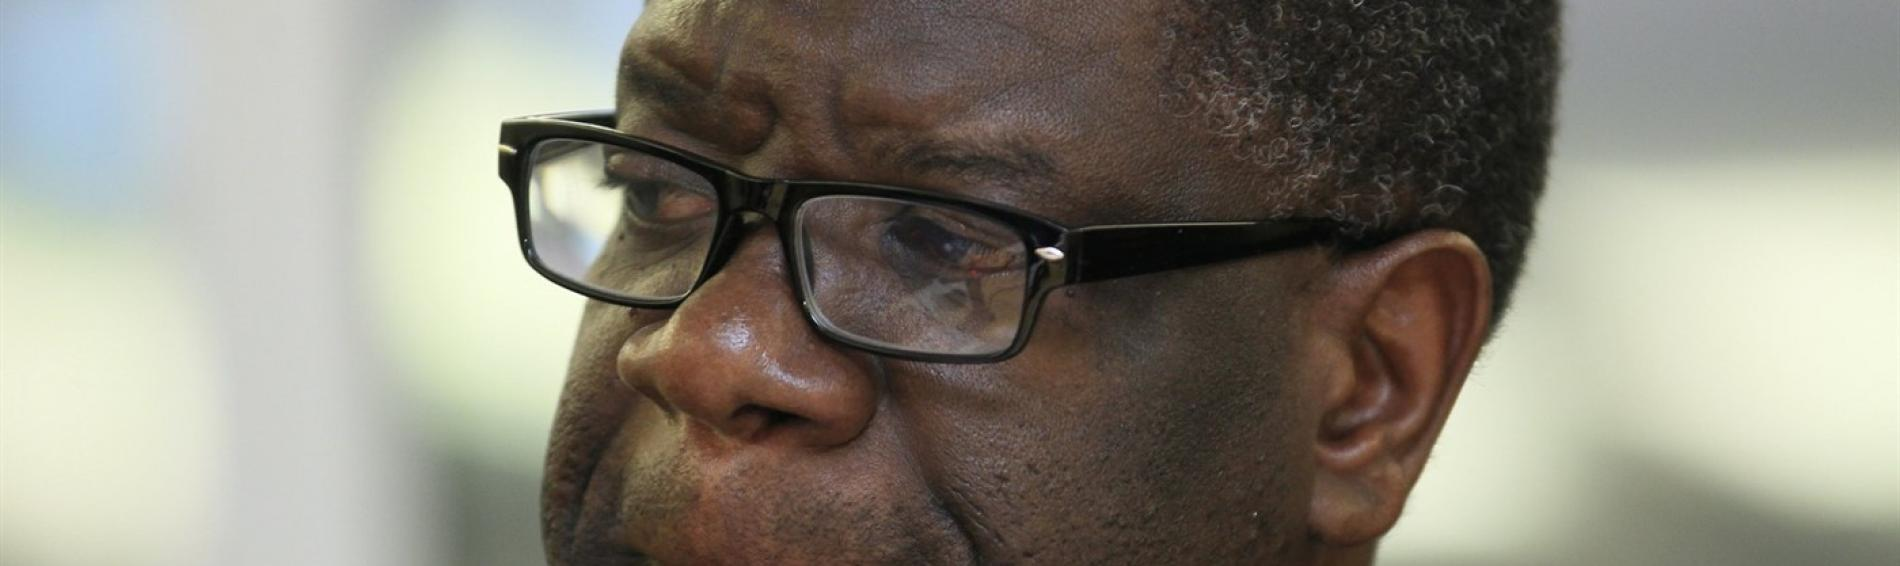 Friedensnobelpreisträger Dr. Denis Mukwege